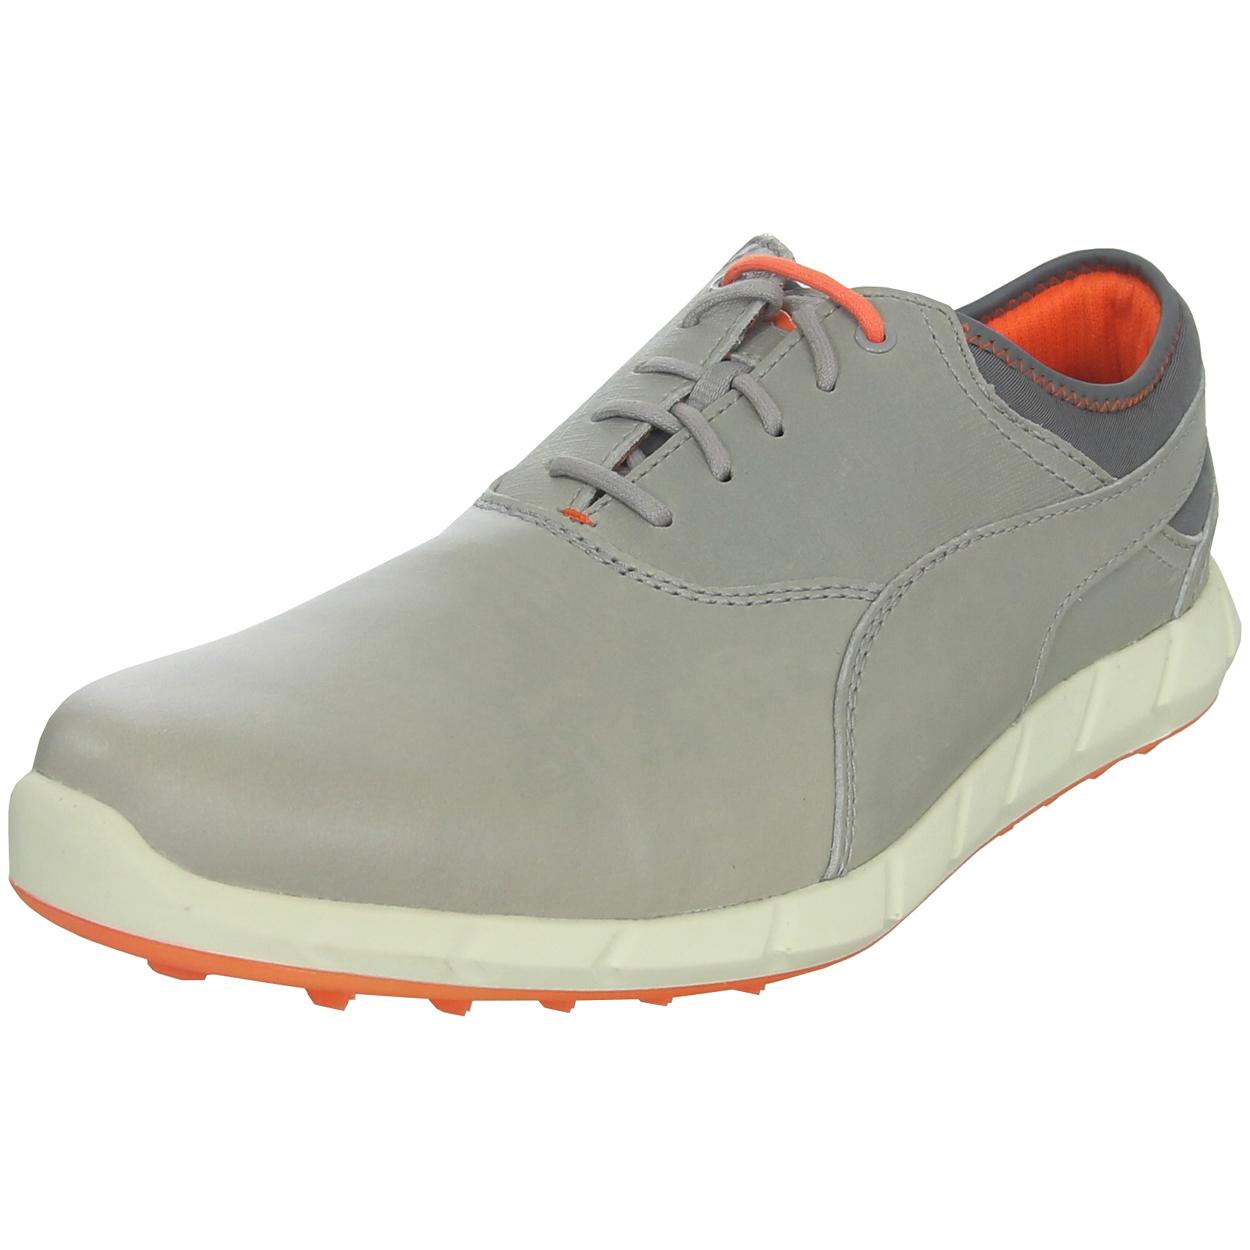 Puma Men S Ignite Spikeless Golf Shoe